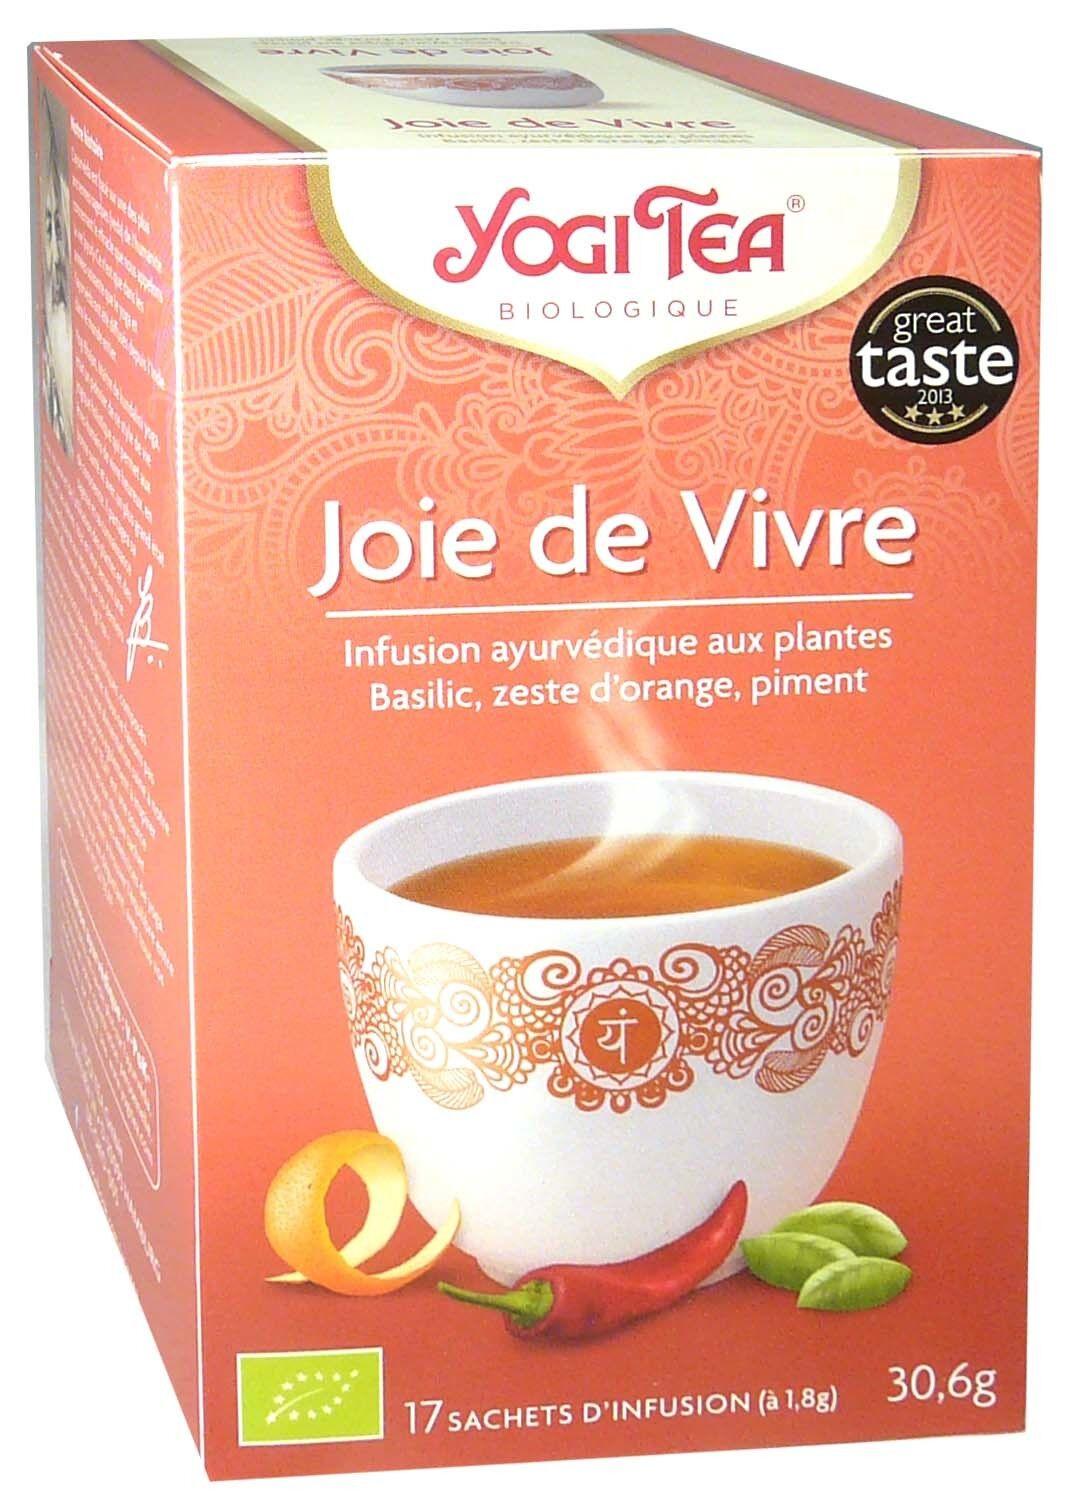 Yogi tea infusion joie de vivre x17 sachets